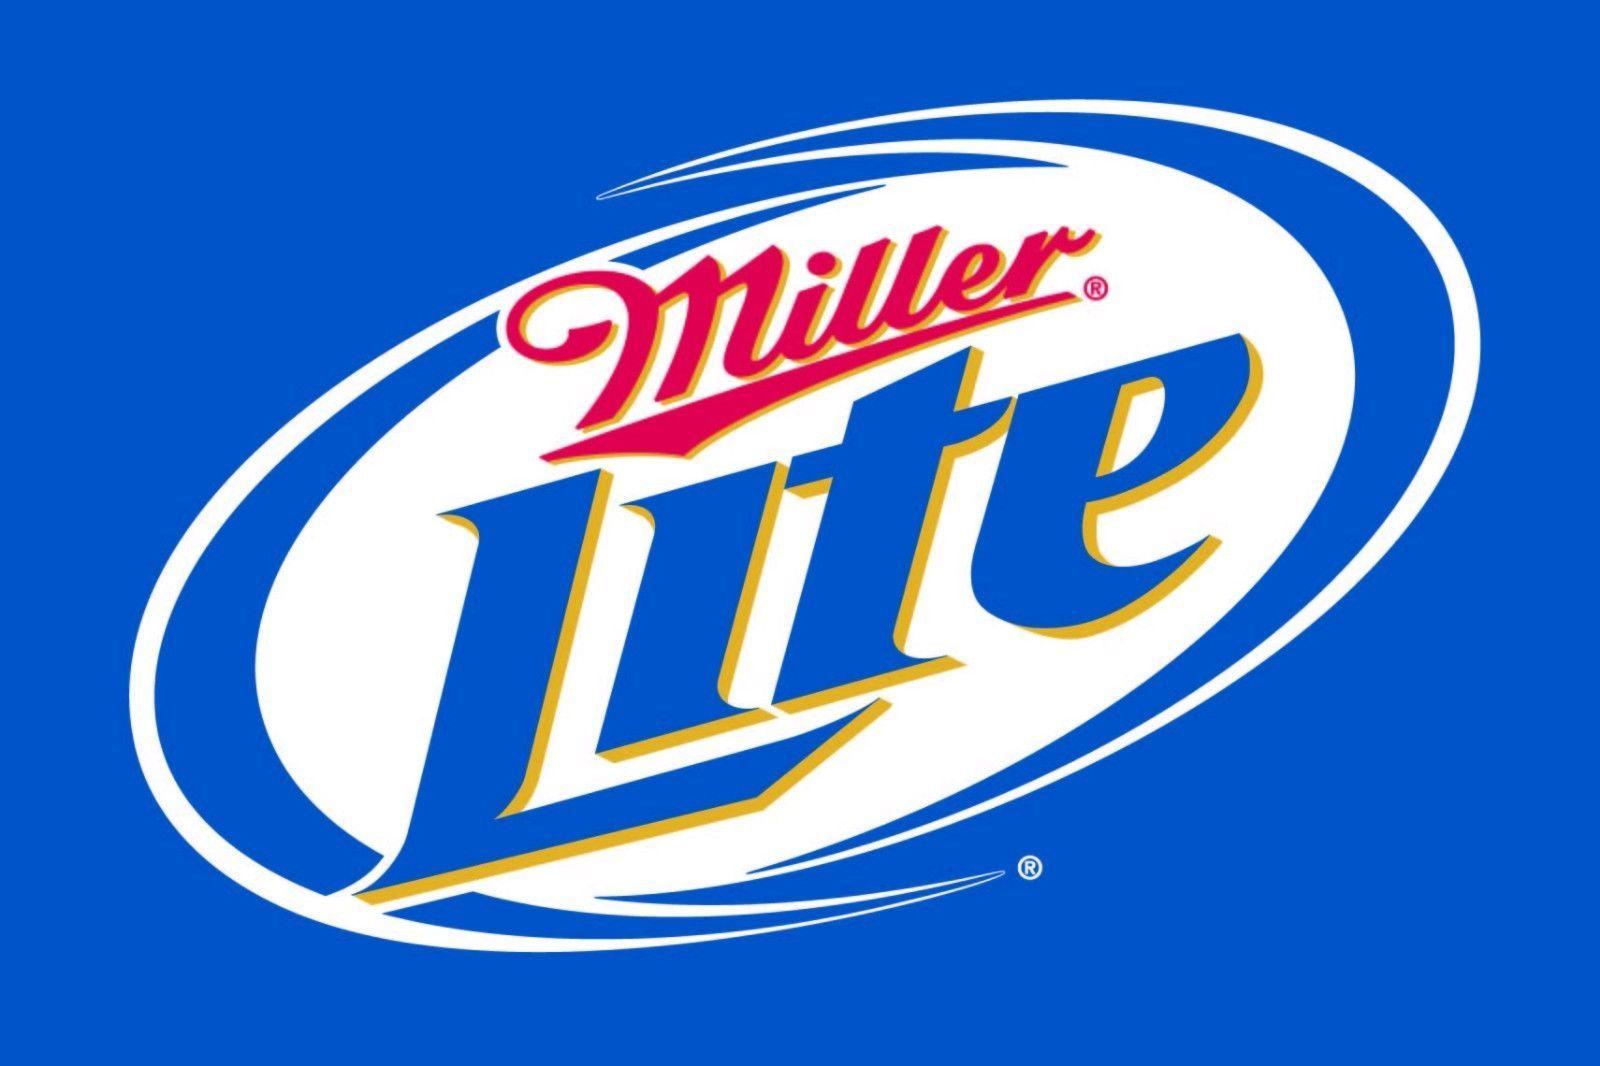 Miller Light Sticker Decal Different Sizes Beer Car Bumper Bar Window Wall Miller Lite Beer Logo Beer Stickers [ 1066 x 1600 Pixel ]